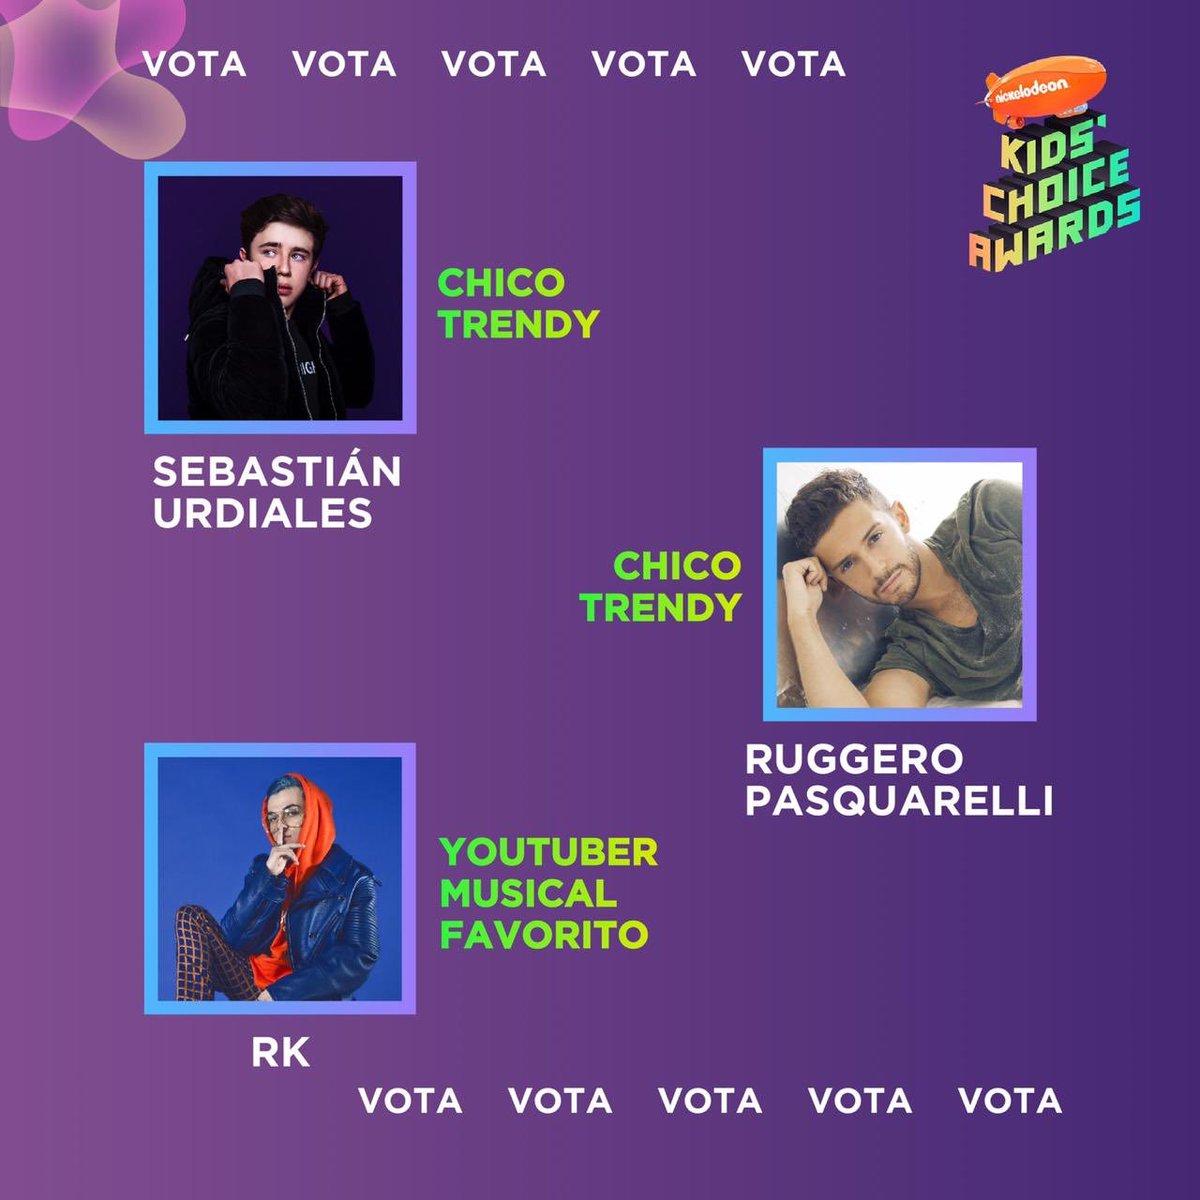 🔁🚀 RT PARA VOTAR 🚀🔁 #KCAMexico + #SebastianUrdialesTrendy #RuggeroPasquarelliTrendy #RKElArtista